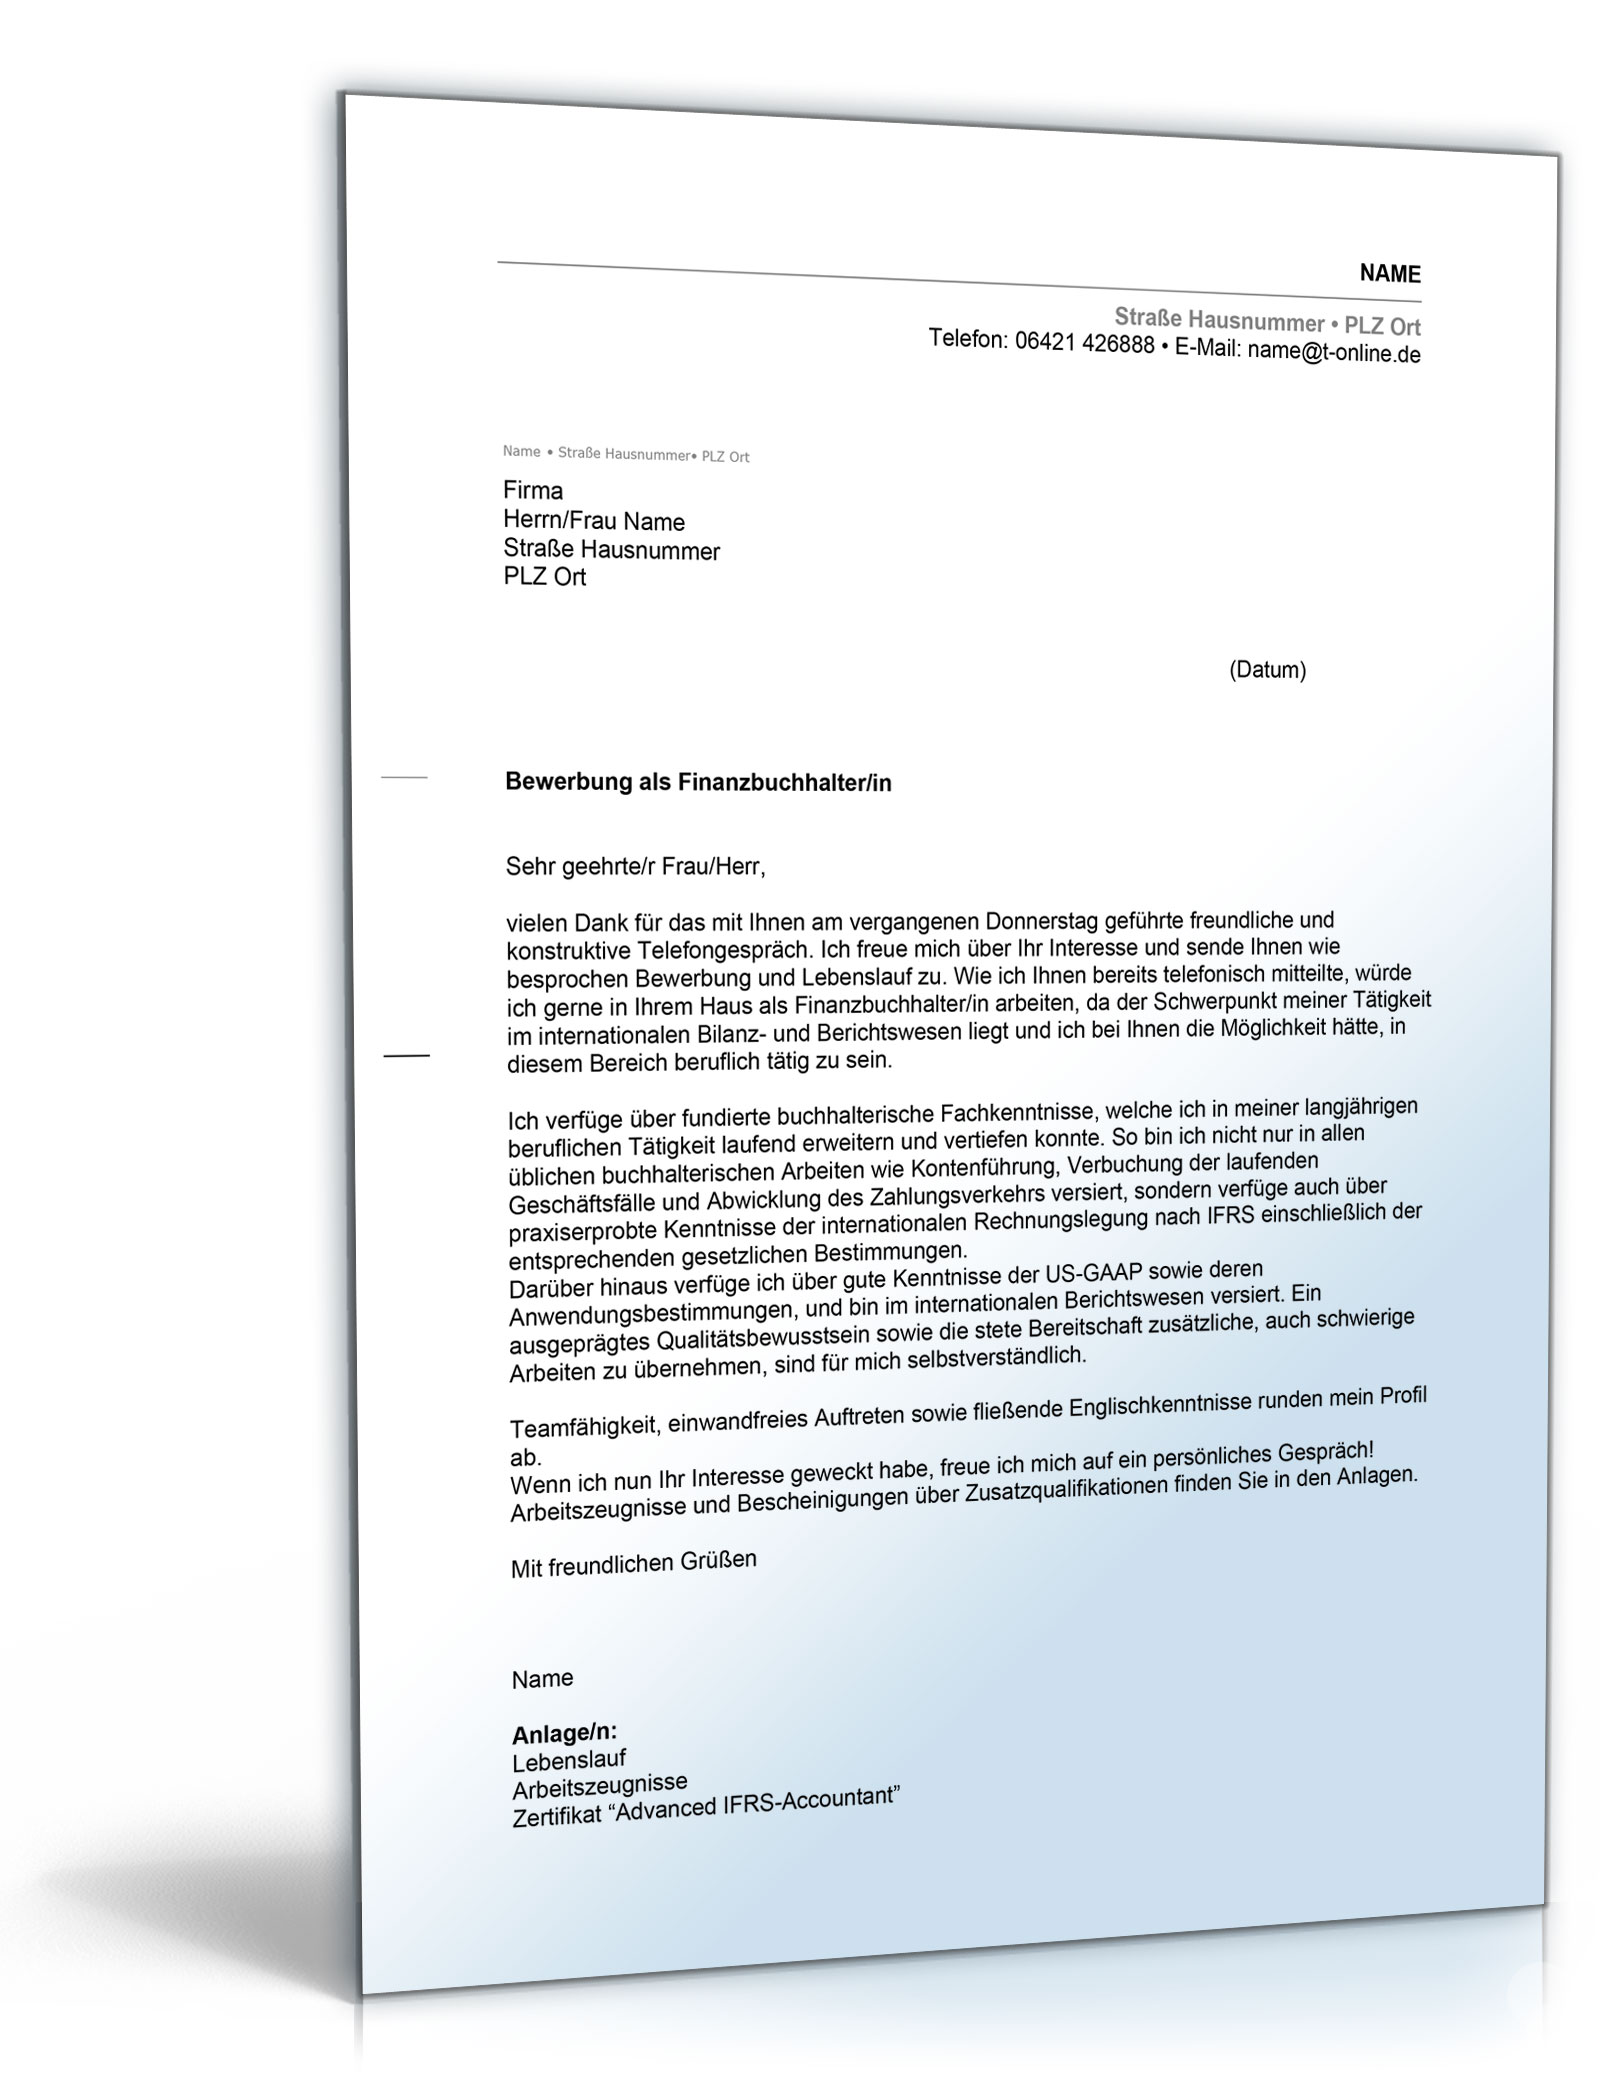 Anschreiben Bewerbung Finanzbuchhaltung [Word Dokument] [Download]:  Amazon.de: Software